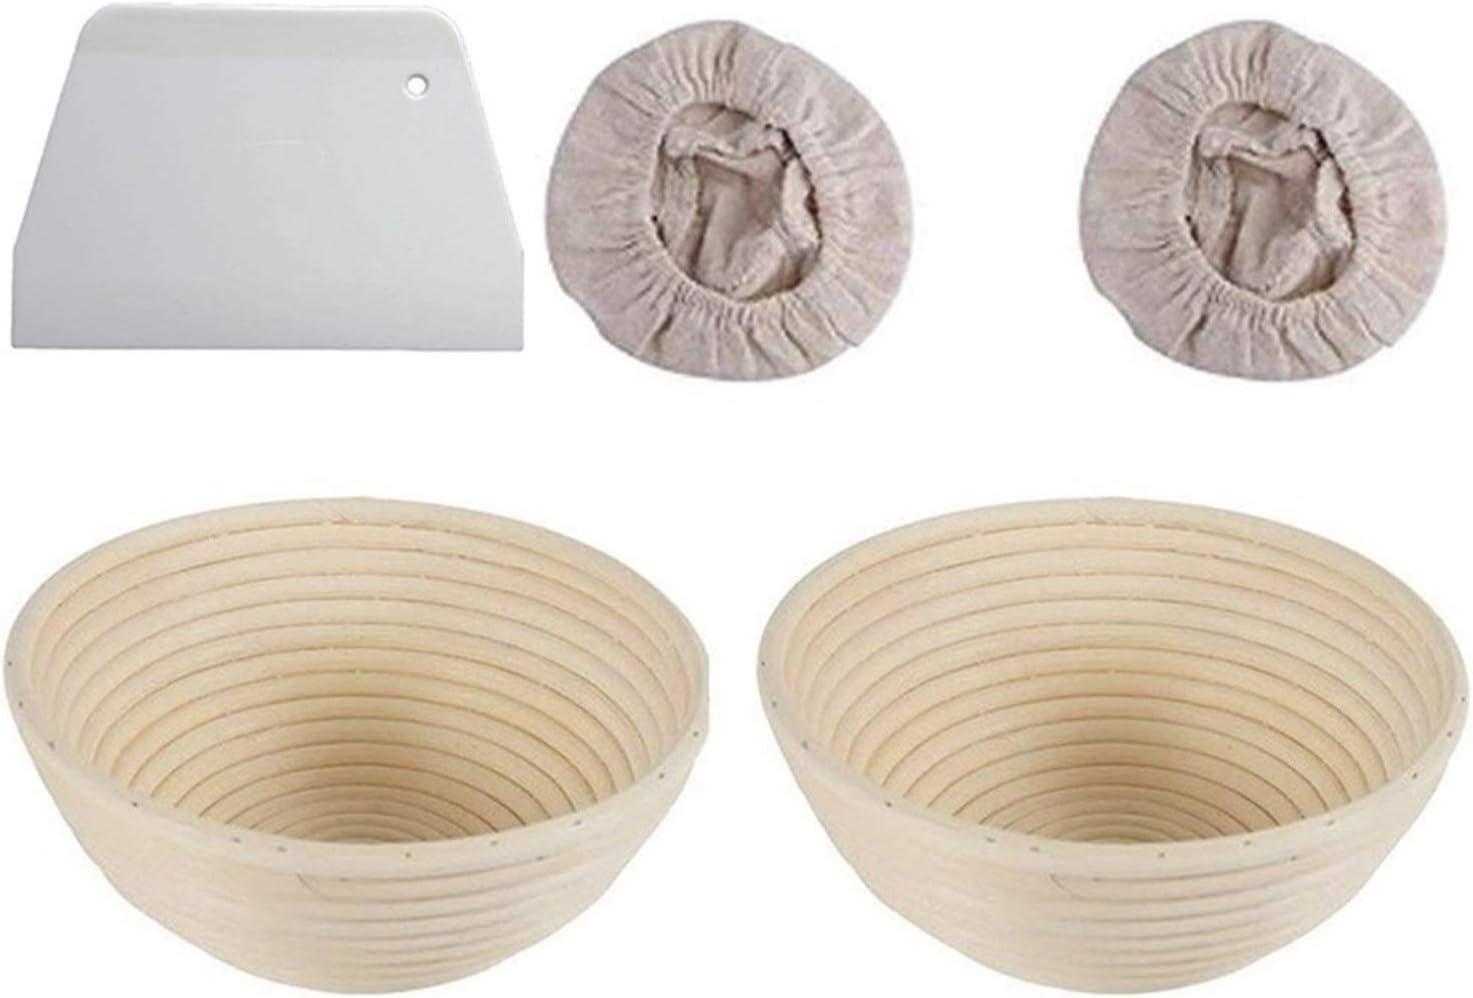 YWSZY Bread Proofing shipfree Baskets 5pcs Chicago Mall Fermentation Set Rattan